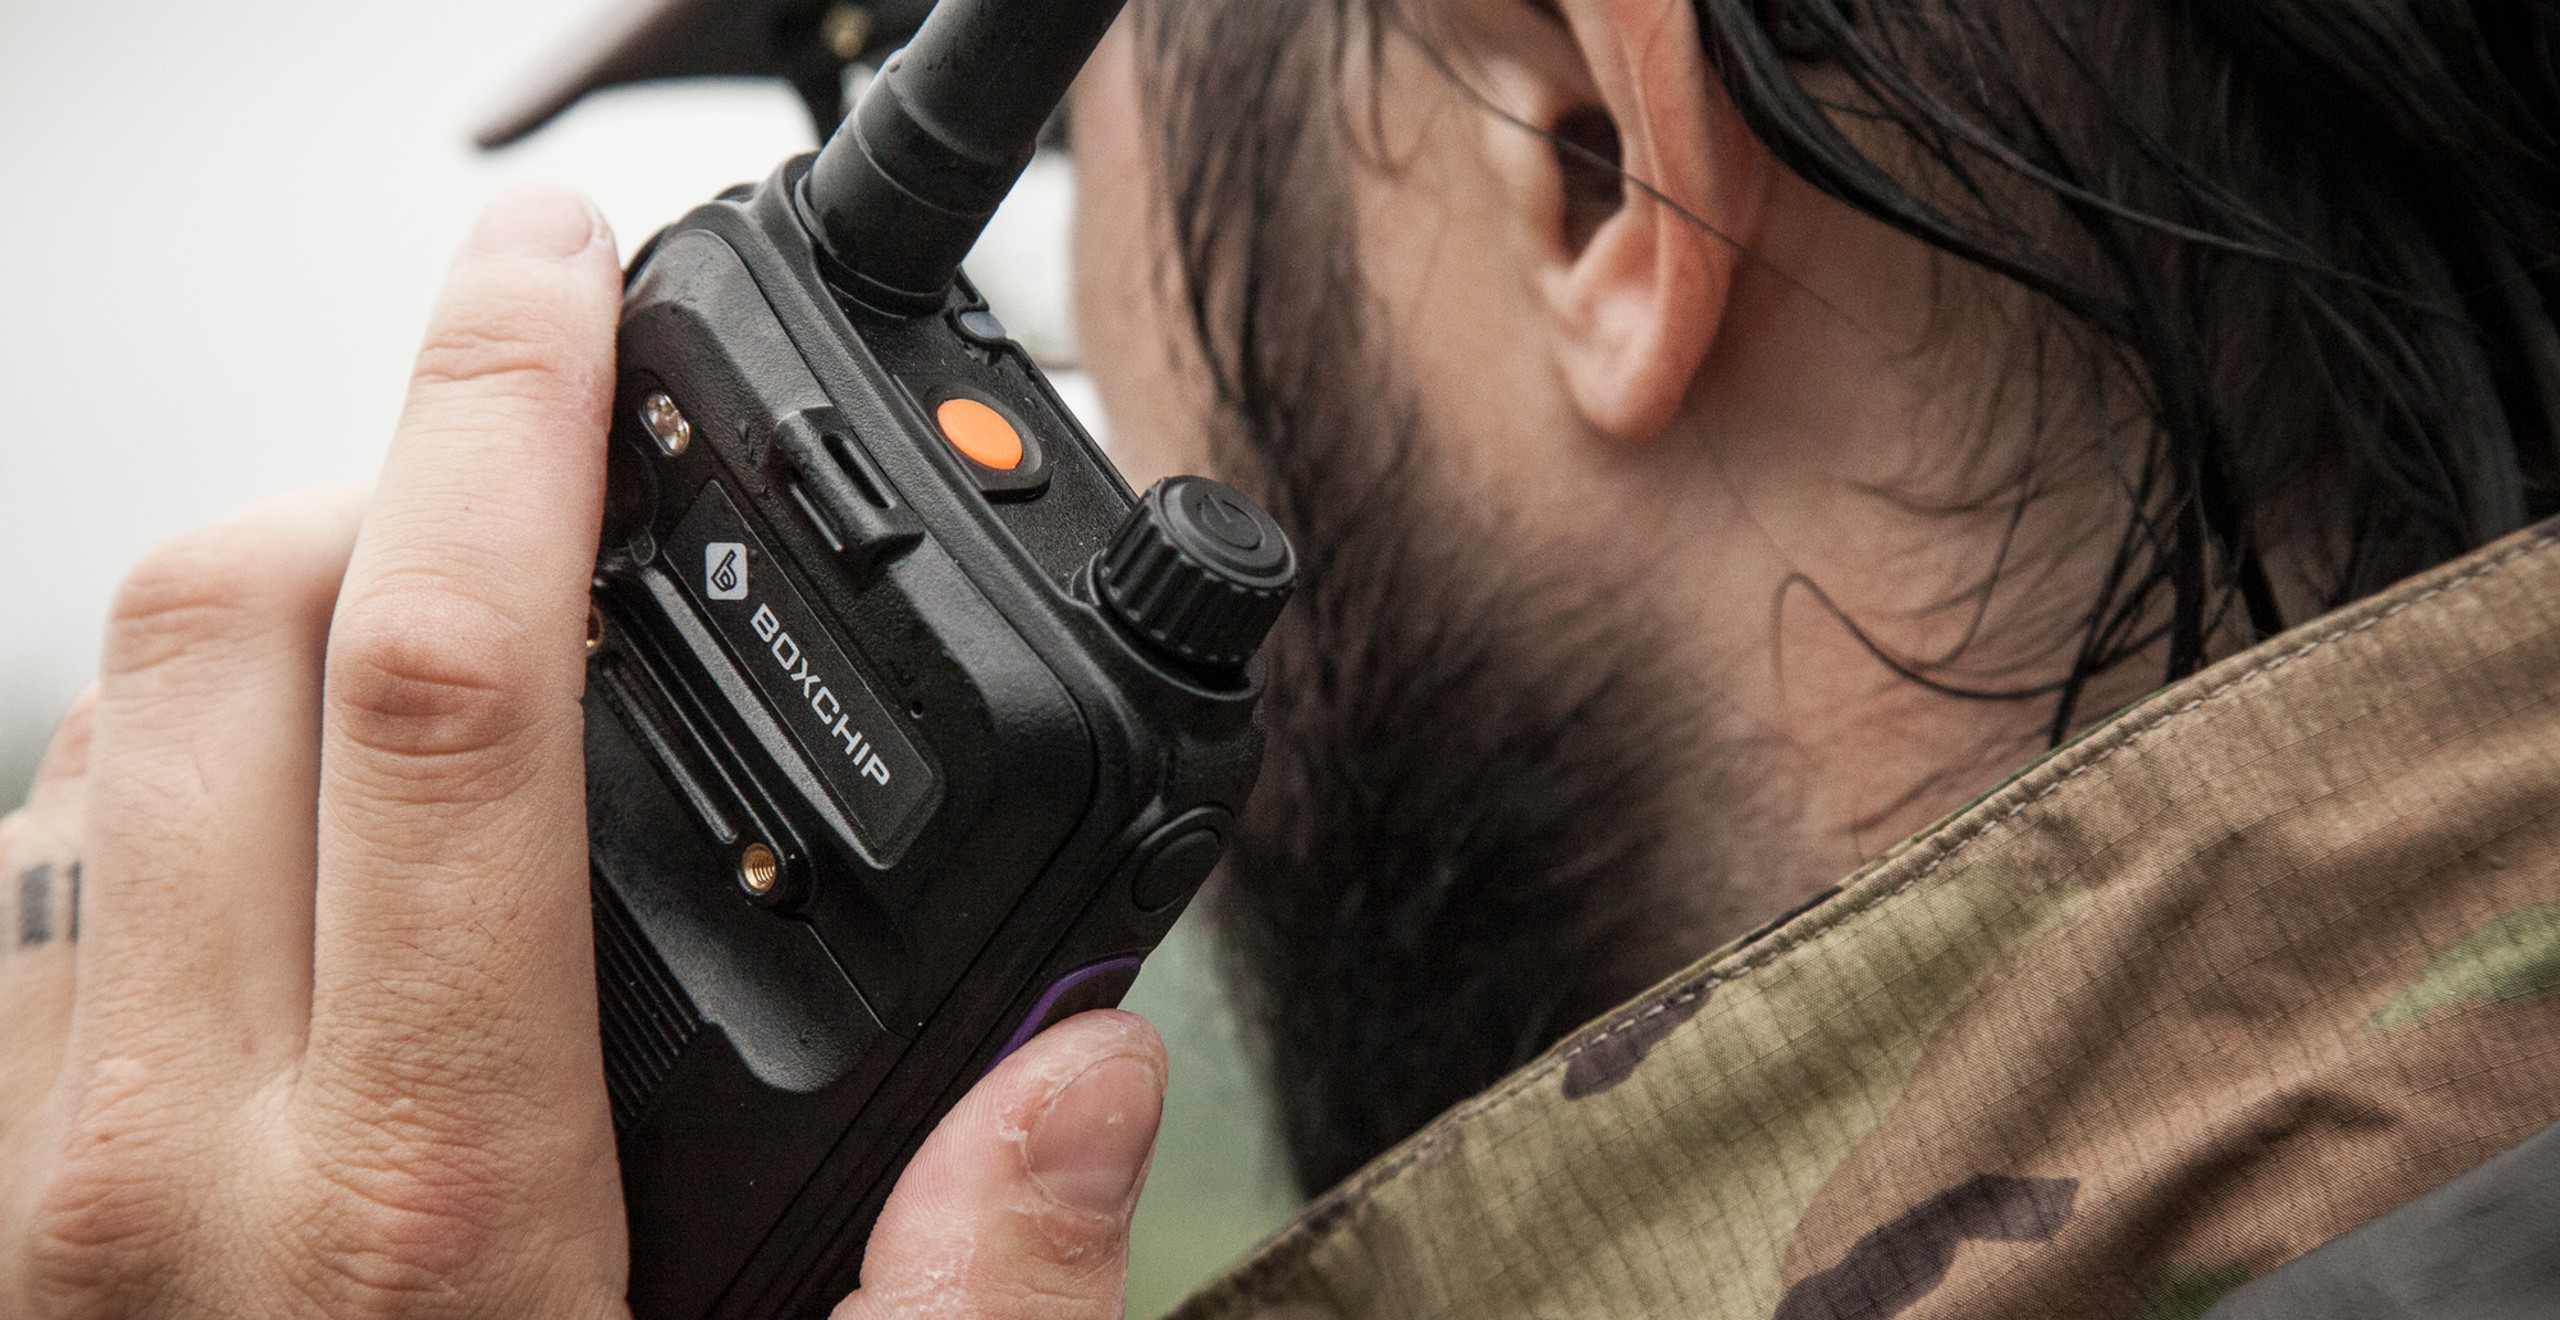 Boxchip S900B Zello tactical accessories poc radio blackline simulations milsim airsoft review